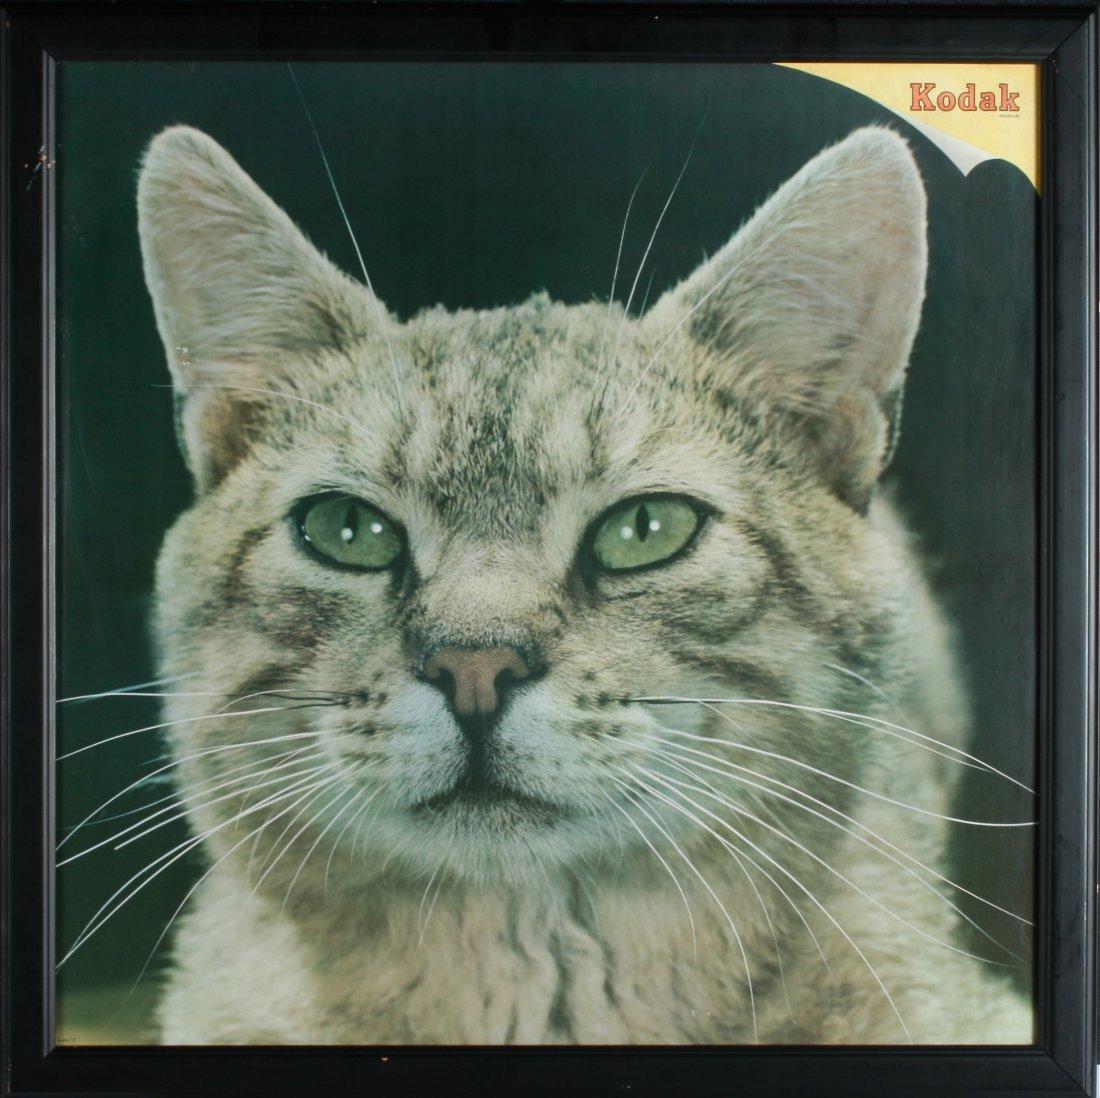 7: A Kodak Meow-ment